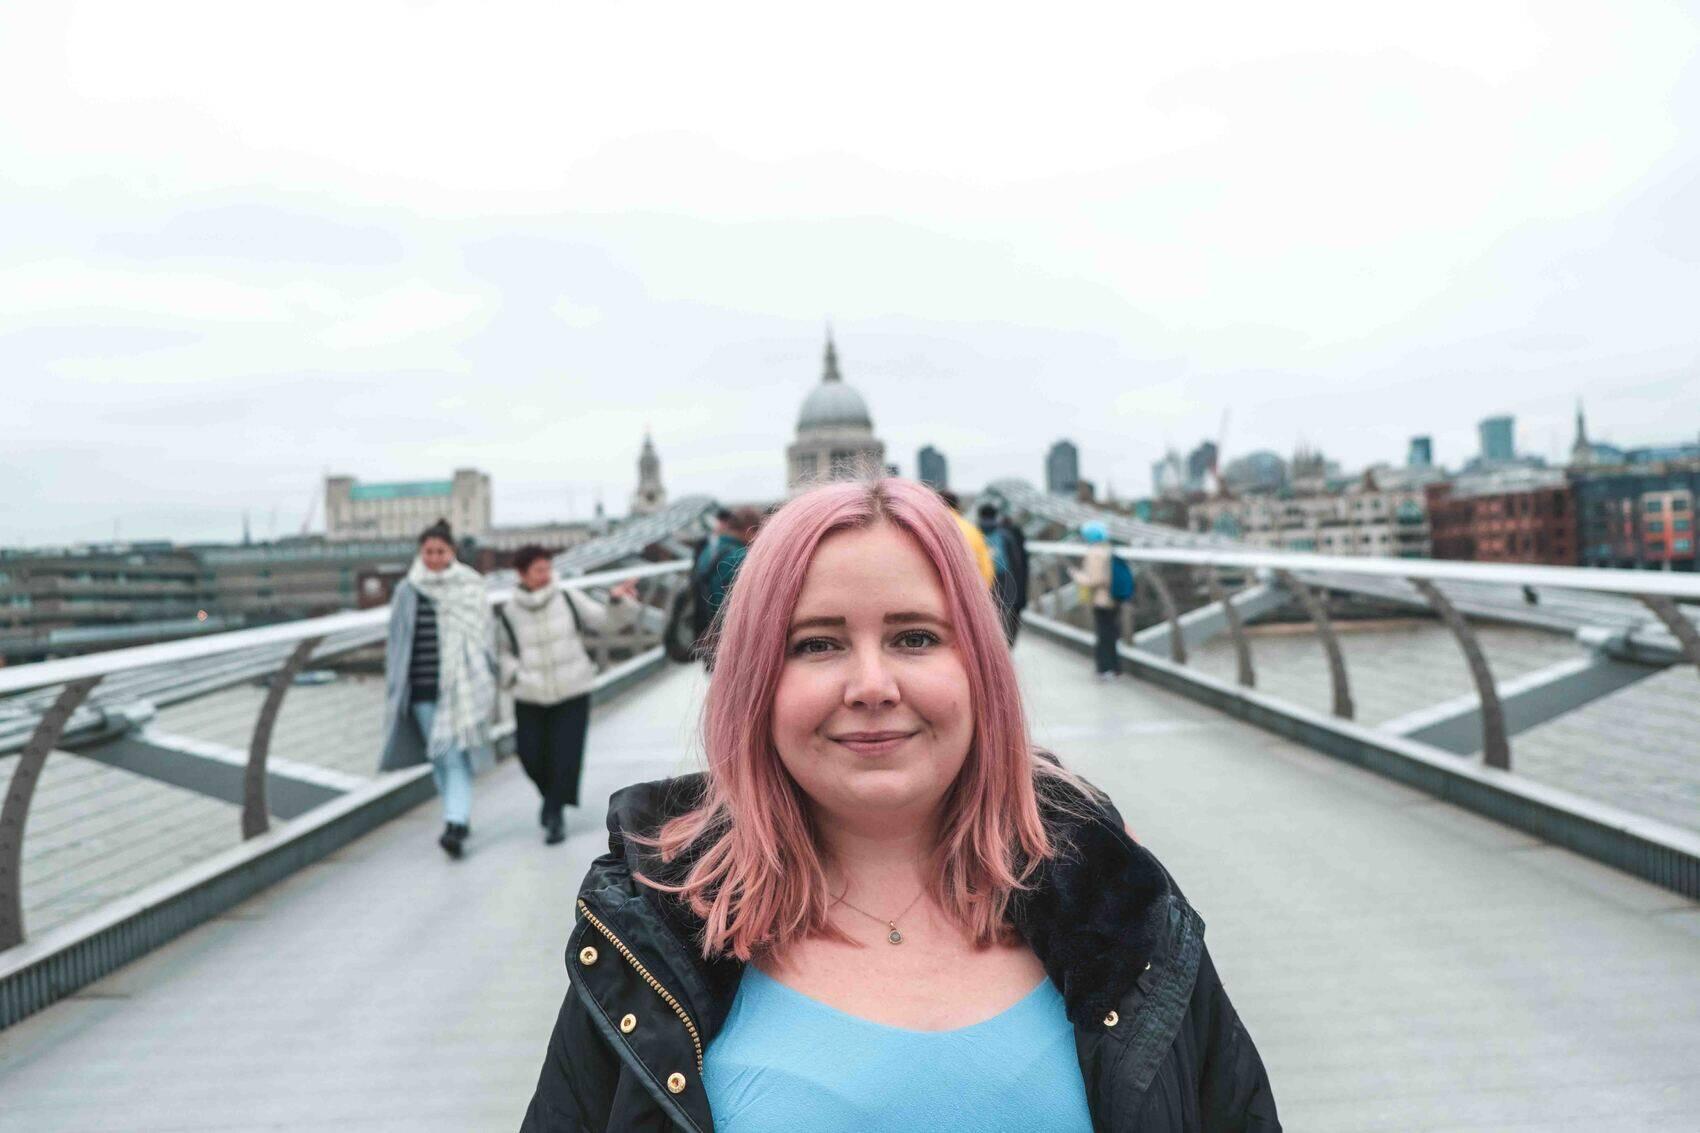 Kat infront of St Pauls London UK